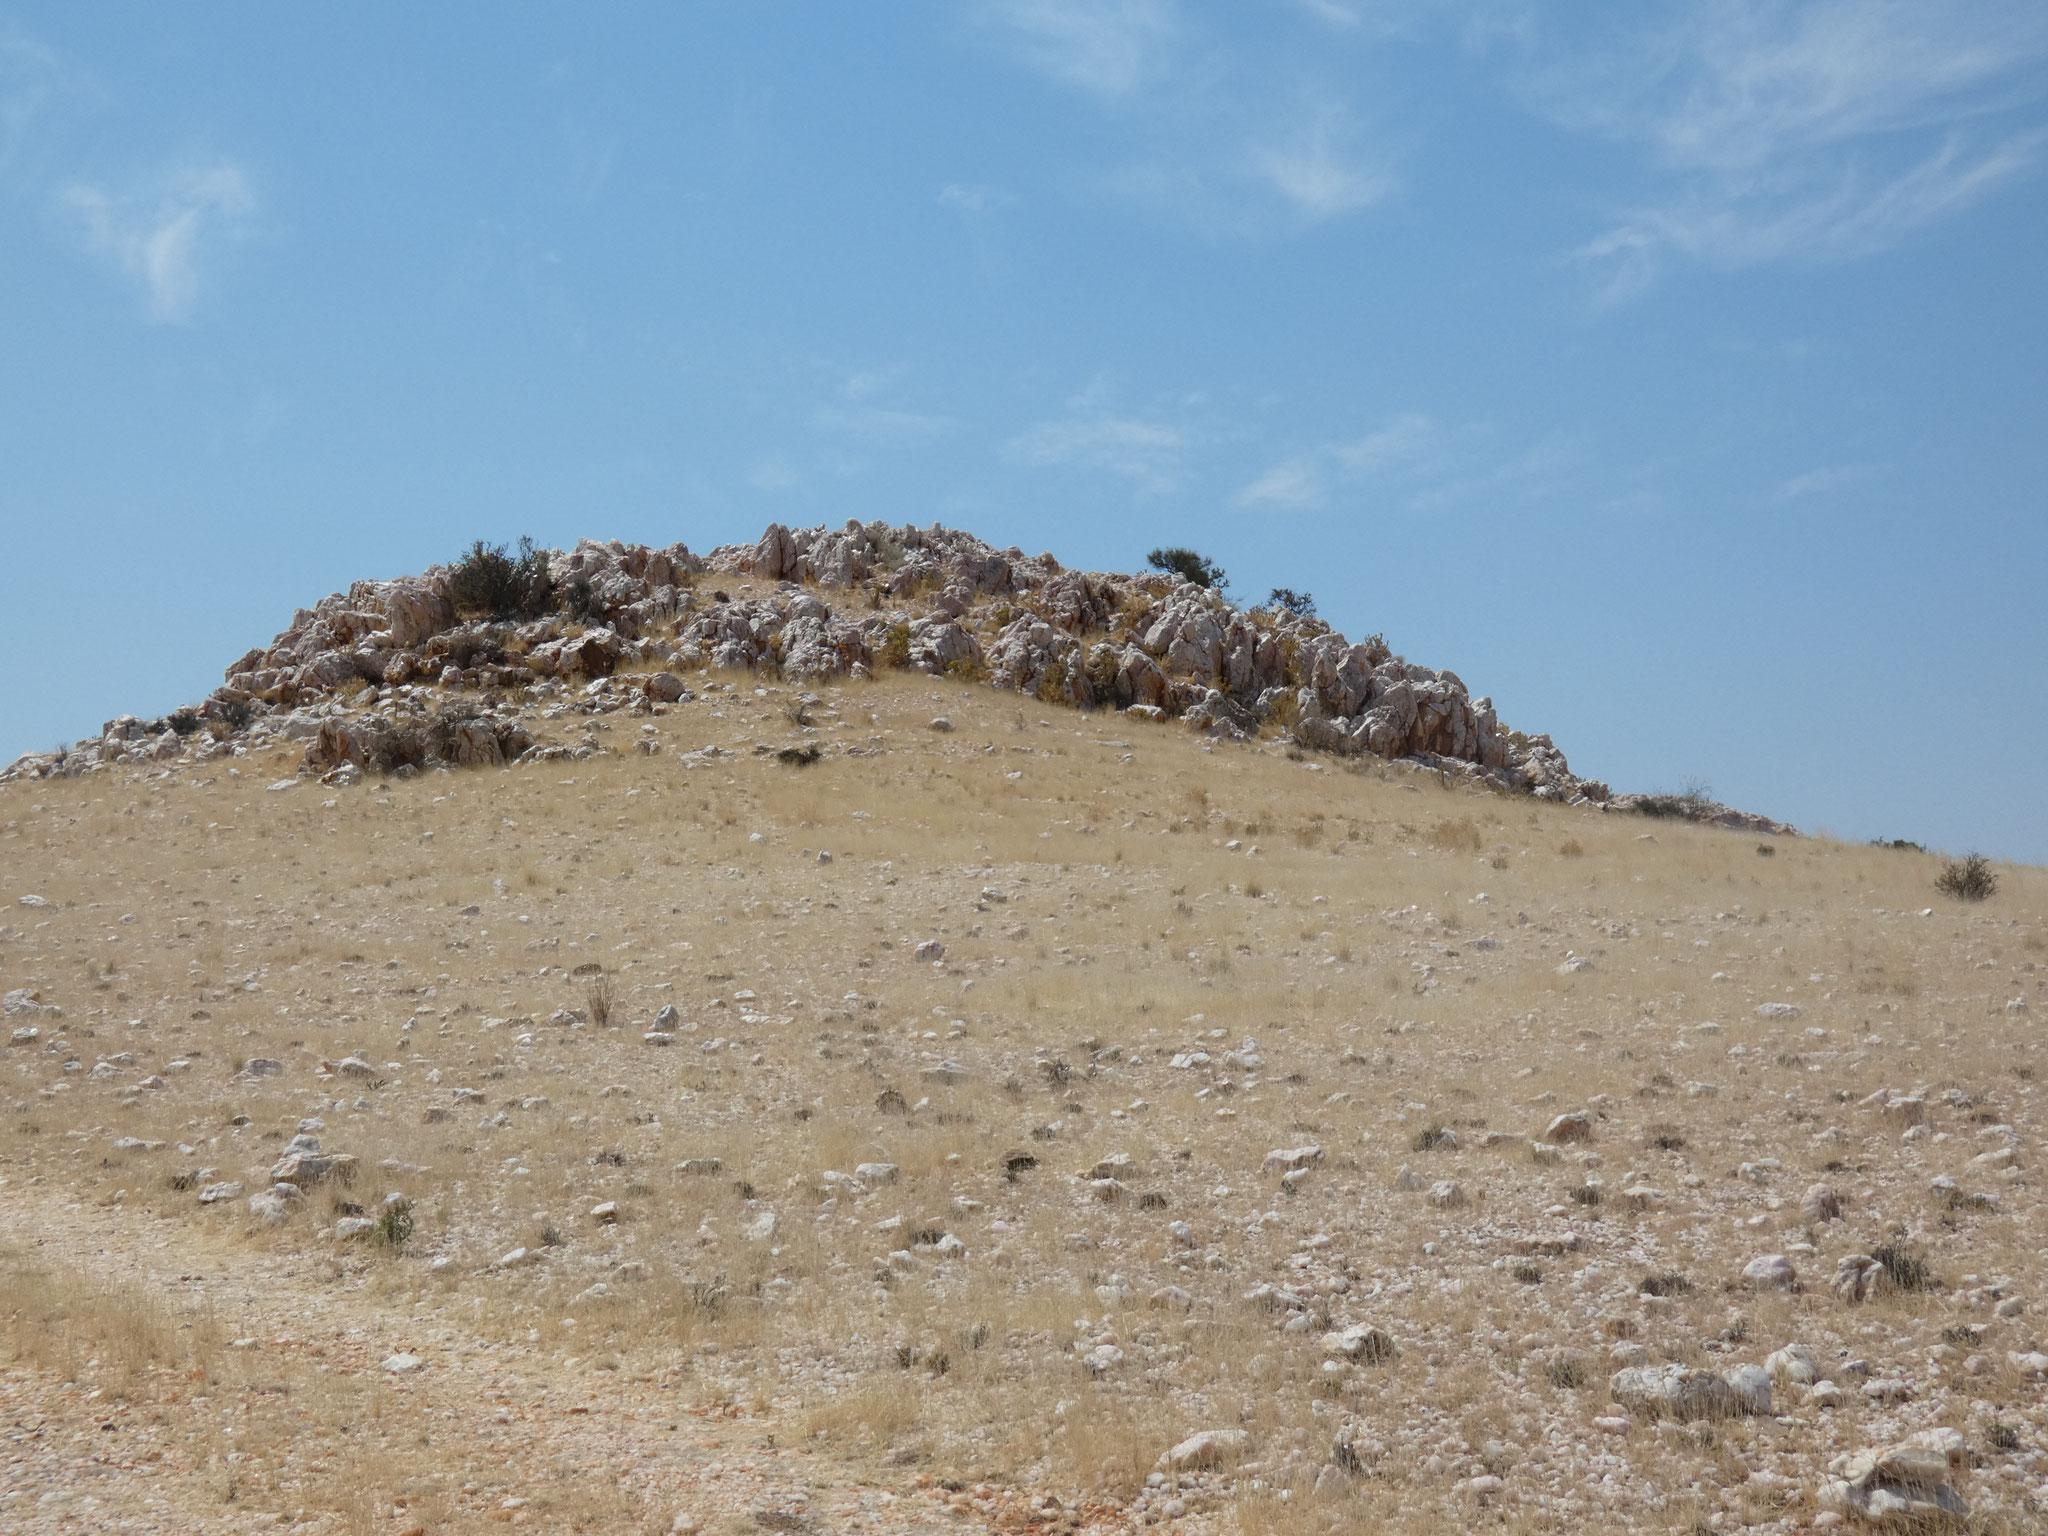 Hügel mit Rosenquarz